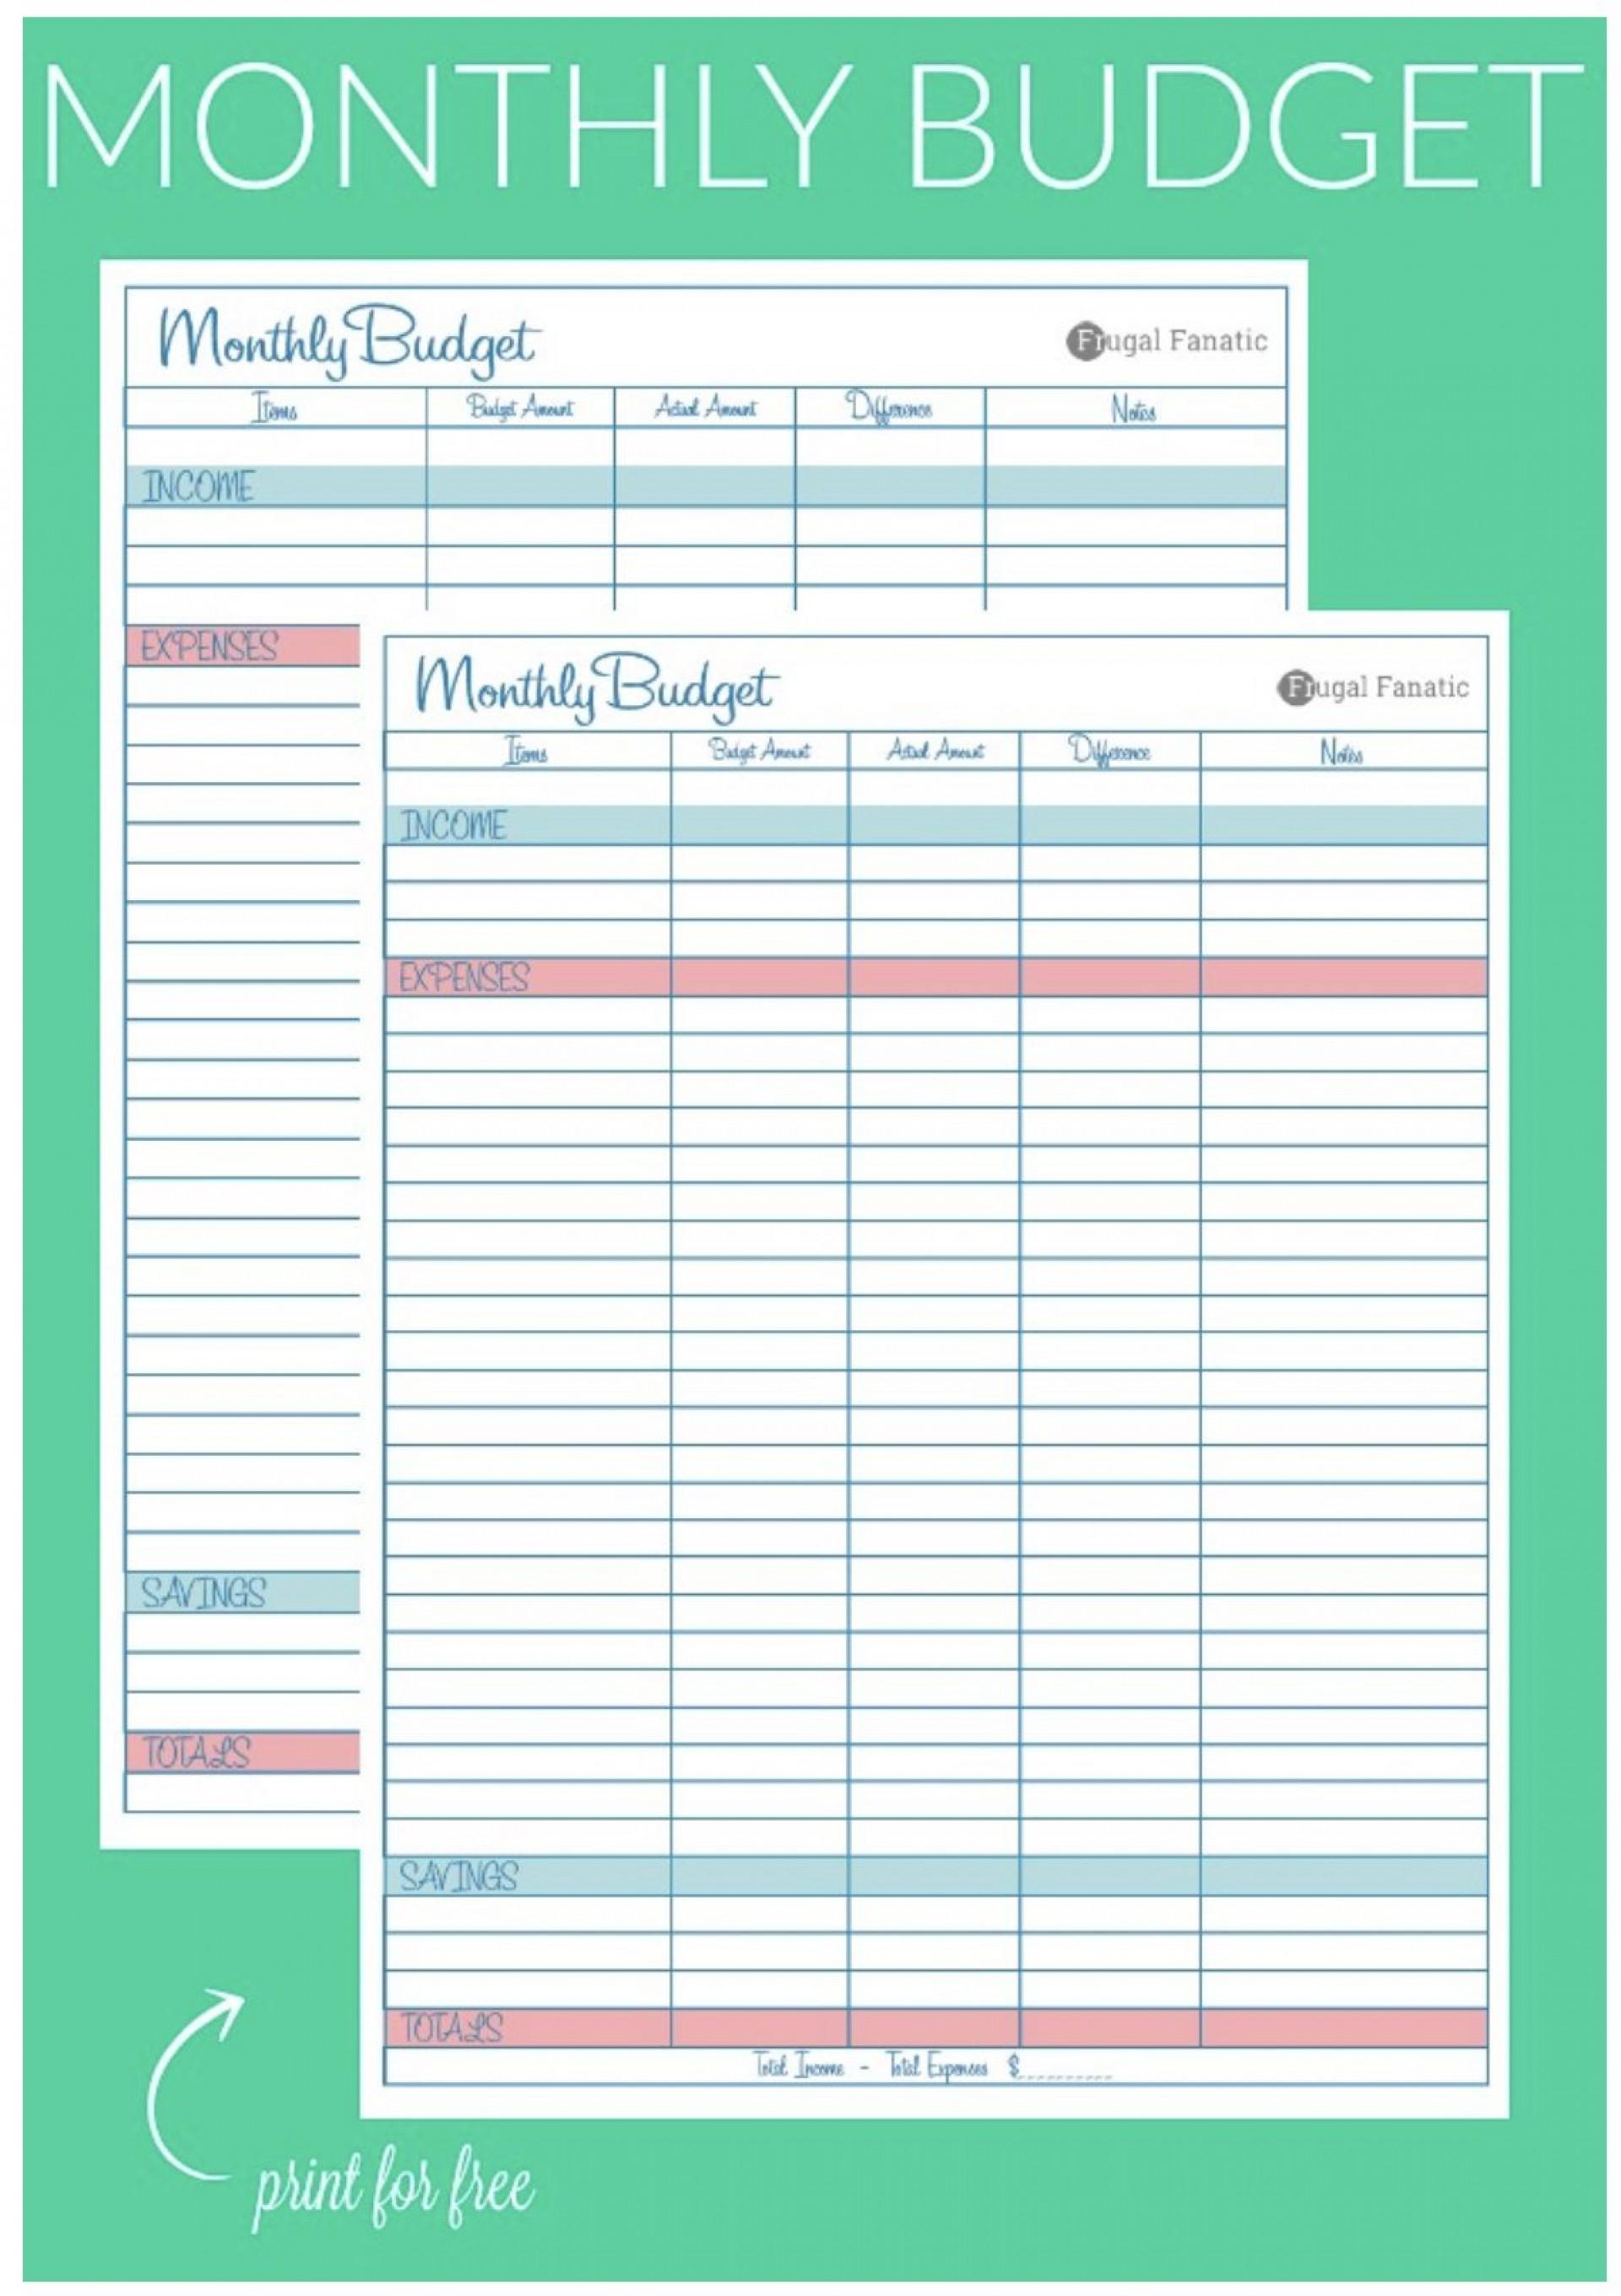 007 Breathtaking Free Blank Monthly Budget Sheet Concept  Printable Worksheet1920